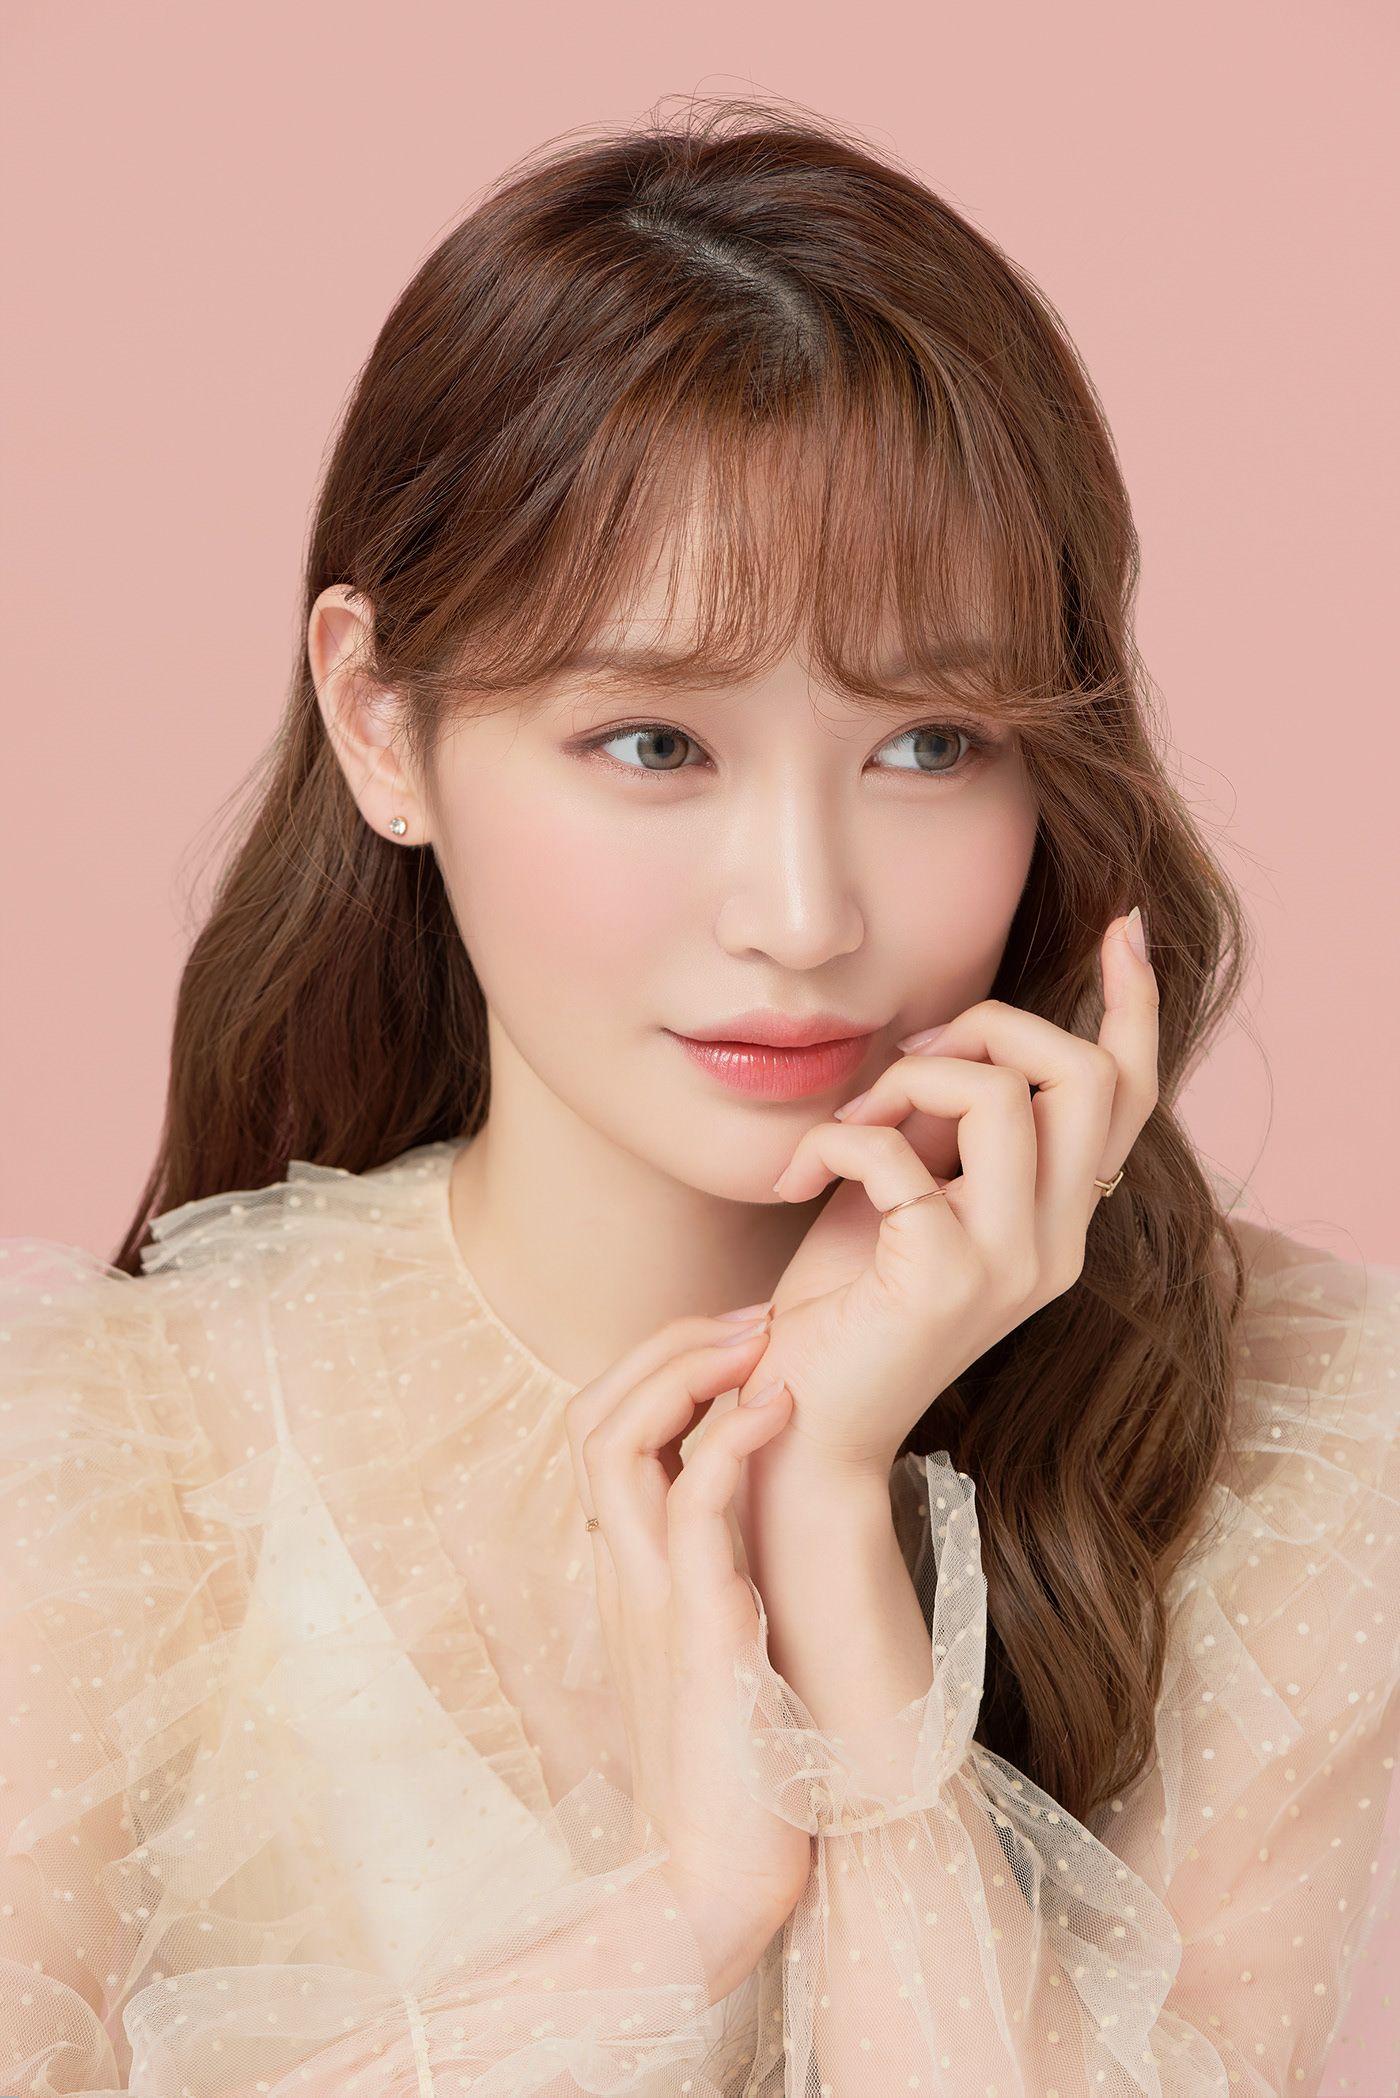 Hea Lin Kwon on Behance Makeup photography, Blusher, Behance